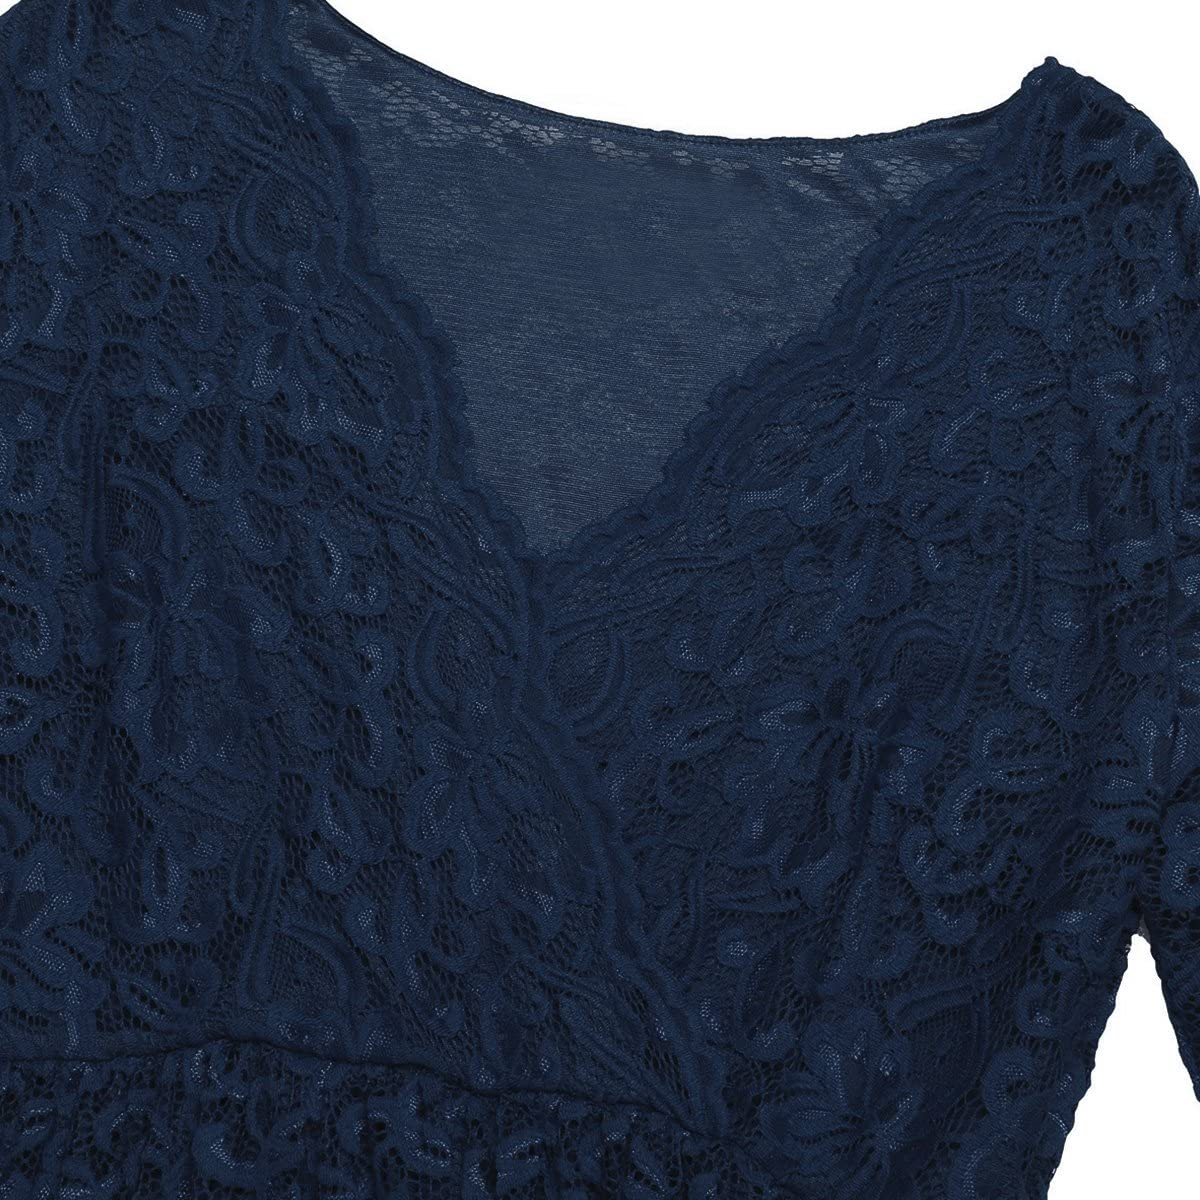 Alvivi Woman Maternity Elegant Photography Dress Floral Lace V Neck Overlay Half Sleeve Pregnant Dresses